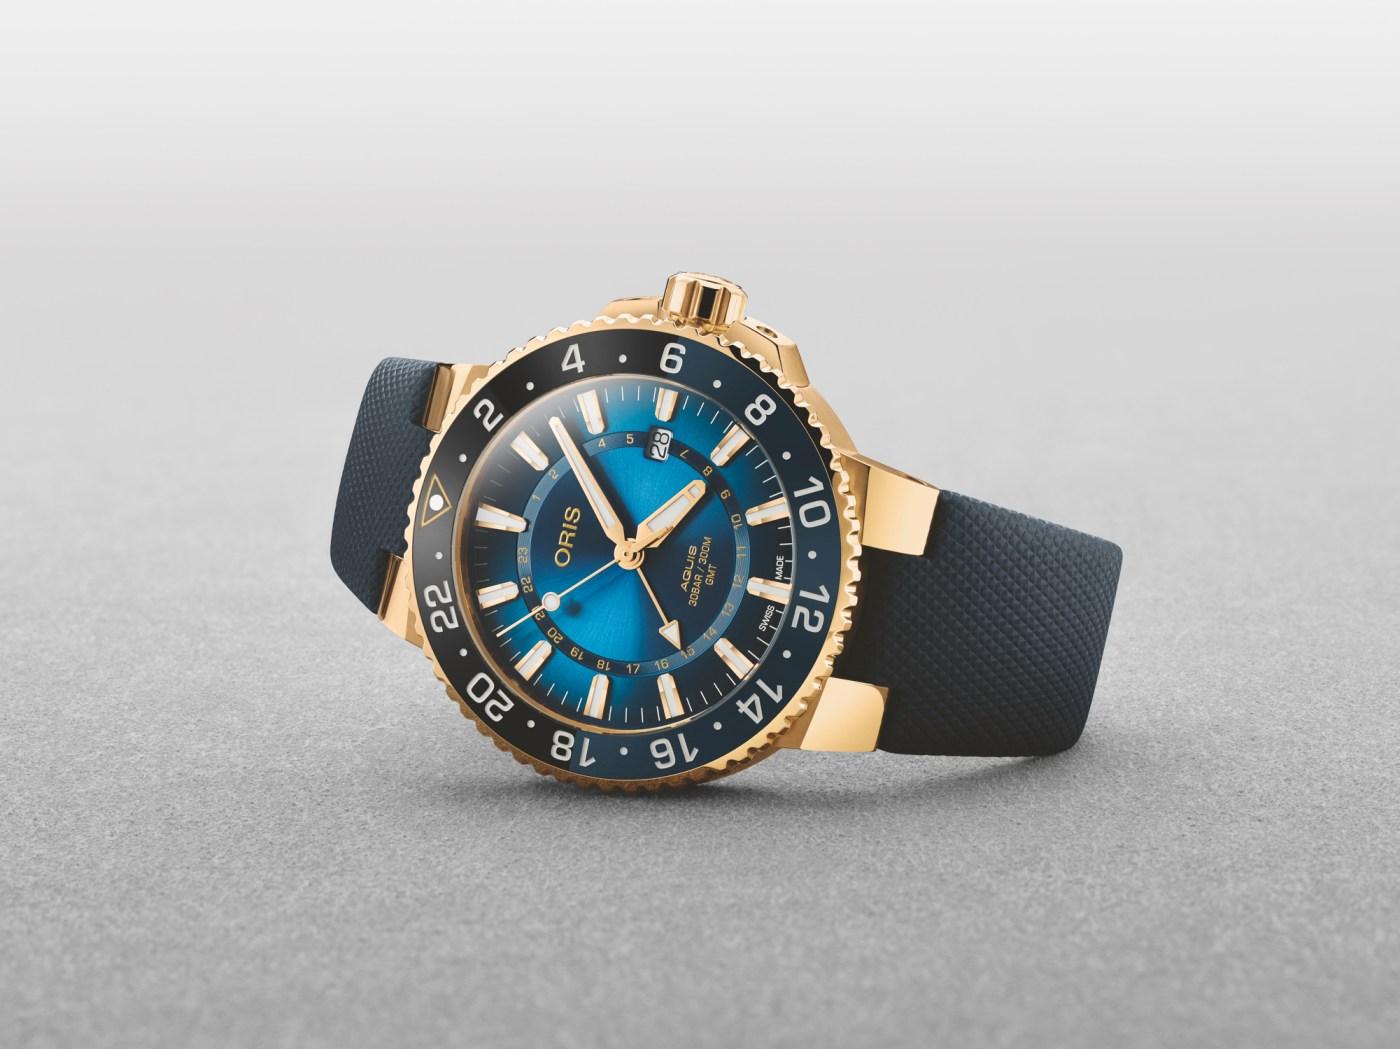 Oris Carysfort Reef Limited Edition 2020